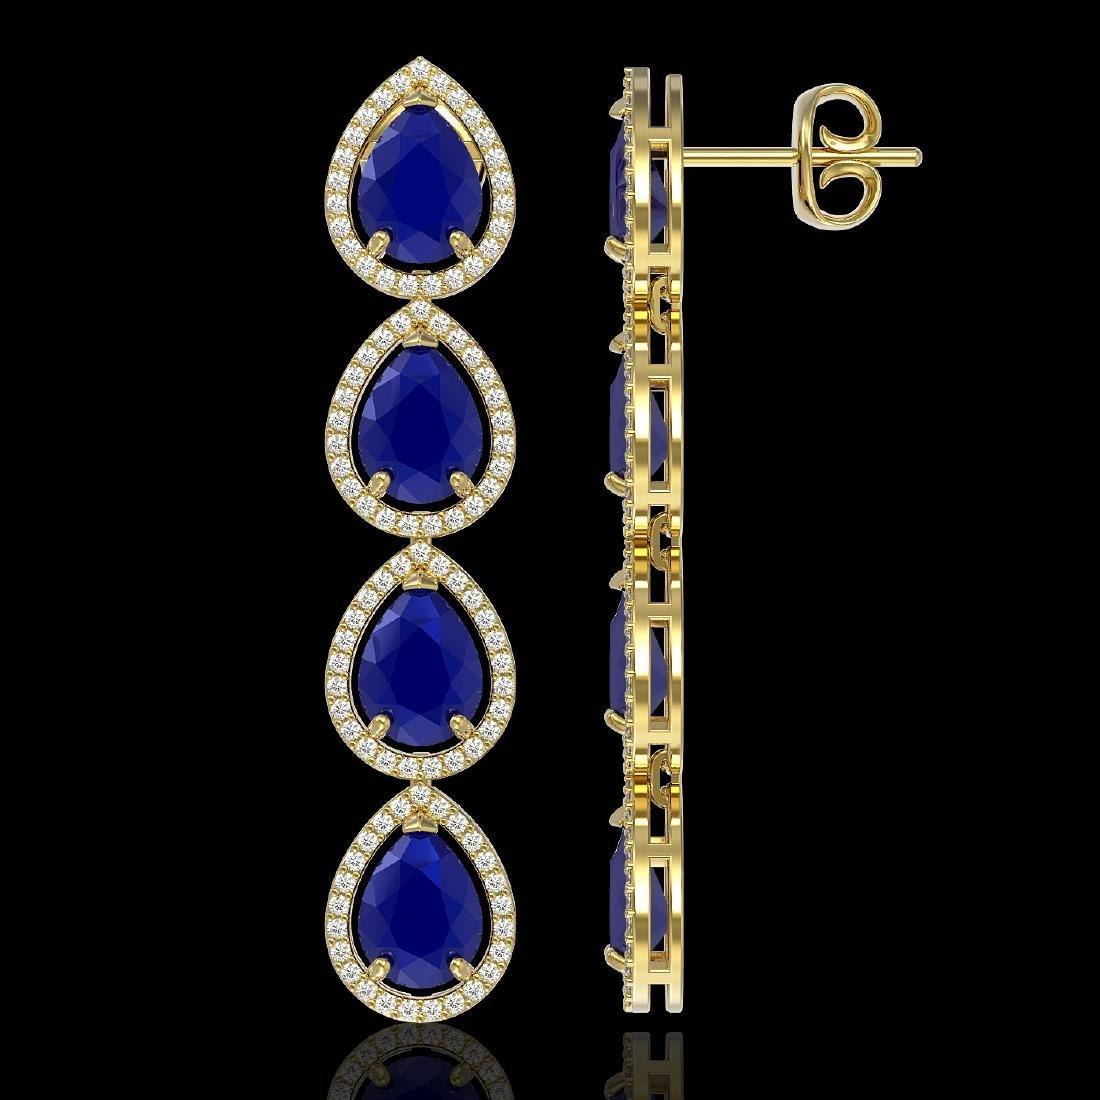 16.01 CTW Sapphire & Diamond Halo Earrings 10K Yellow - 2